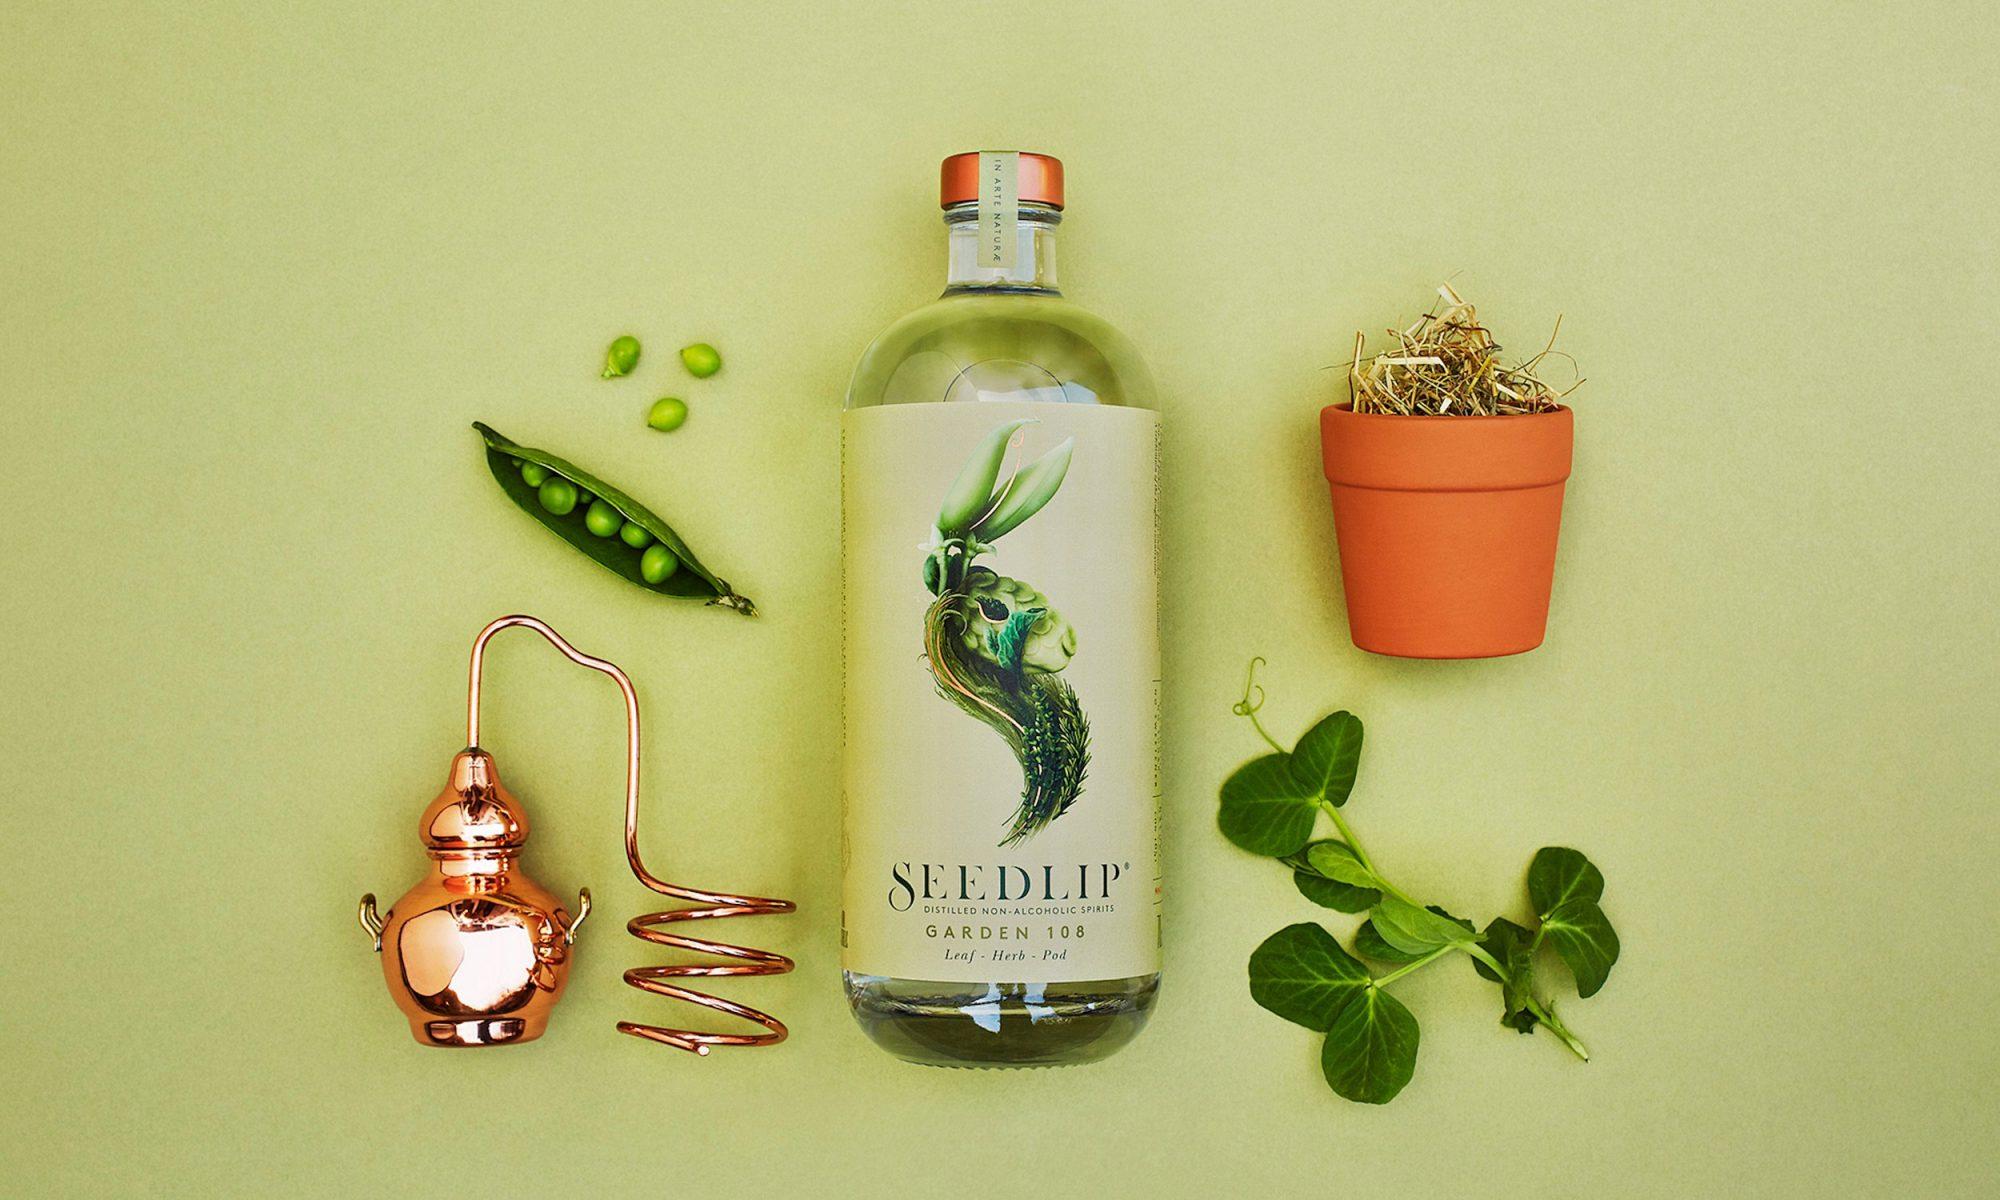 seedlip nonalcoholic drink